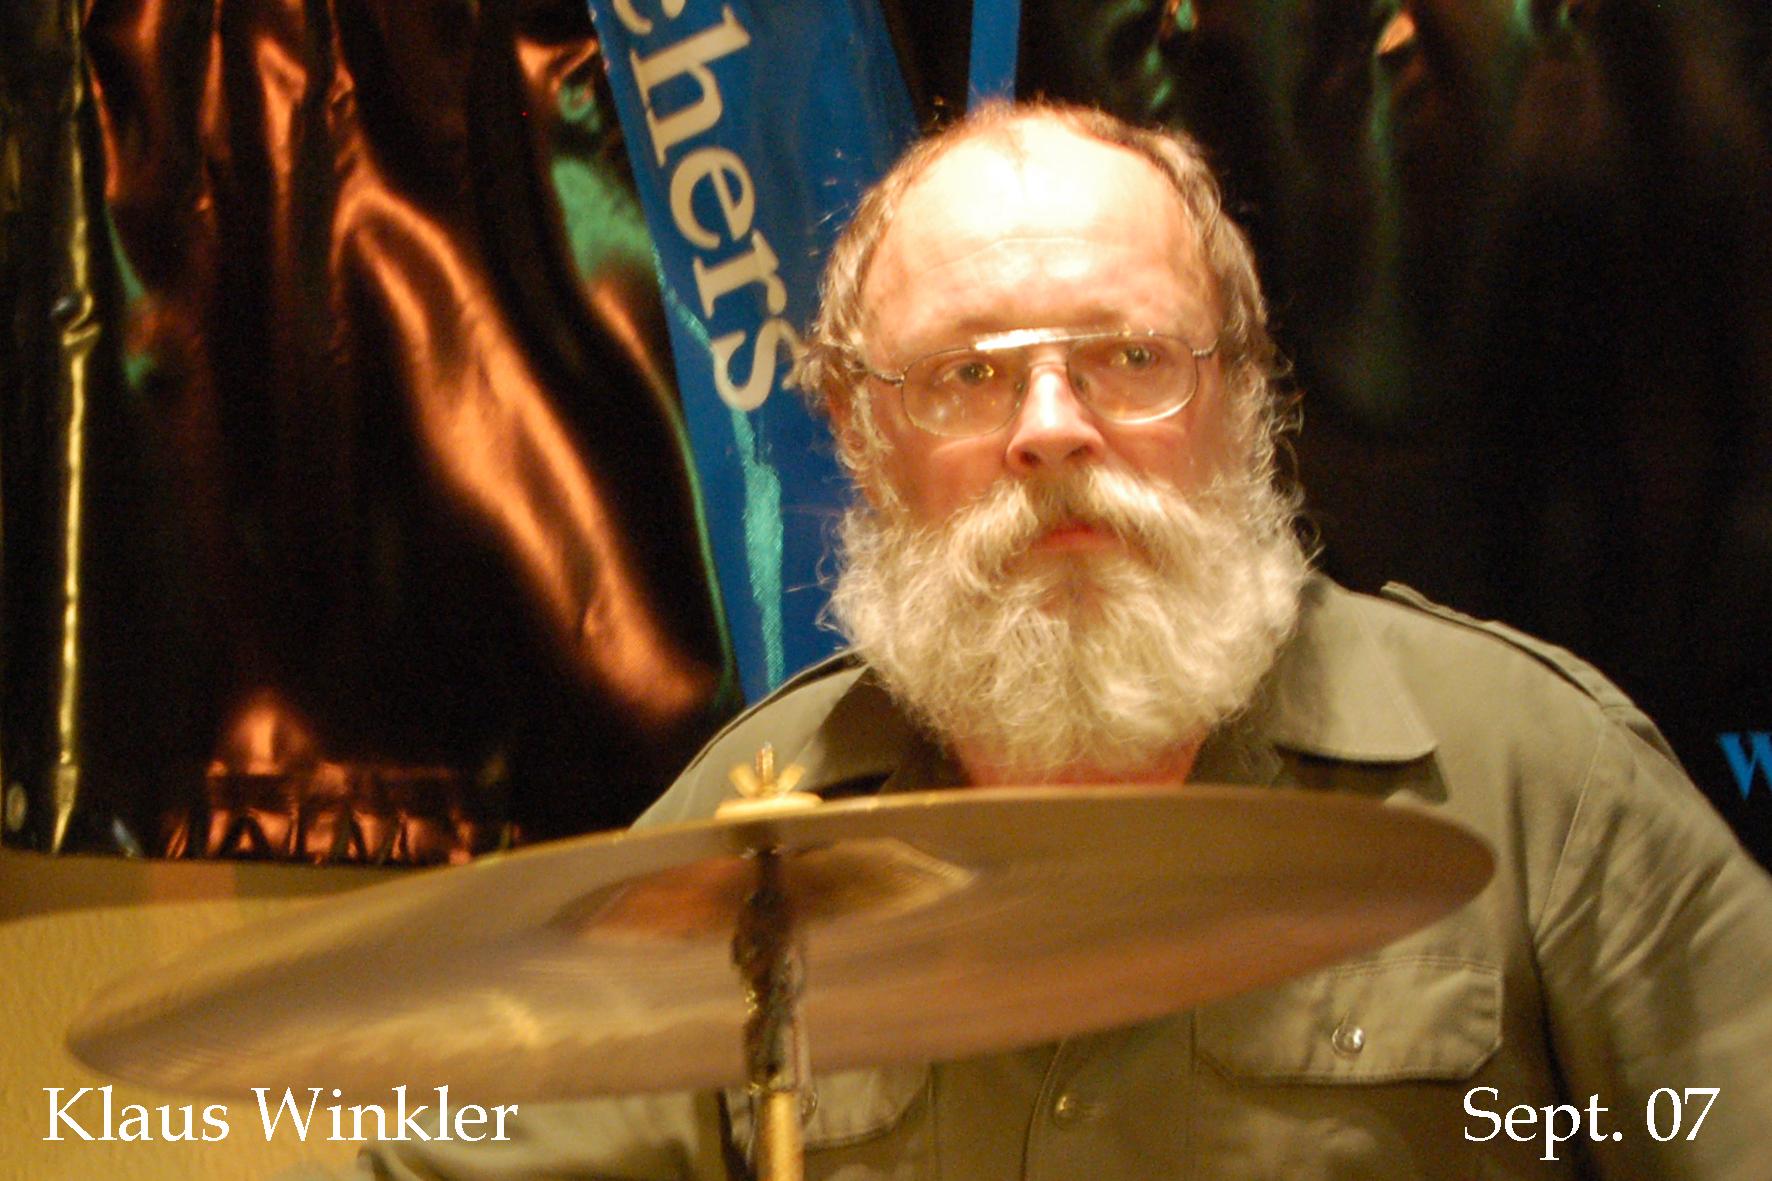 Klaus Winkler